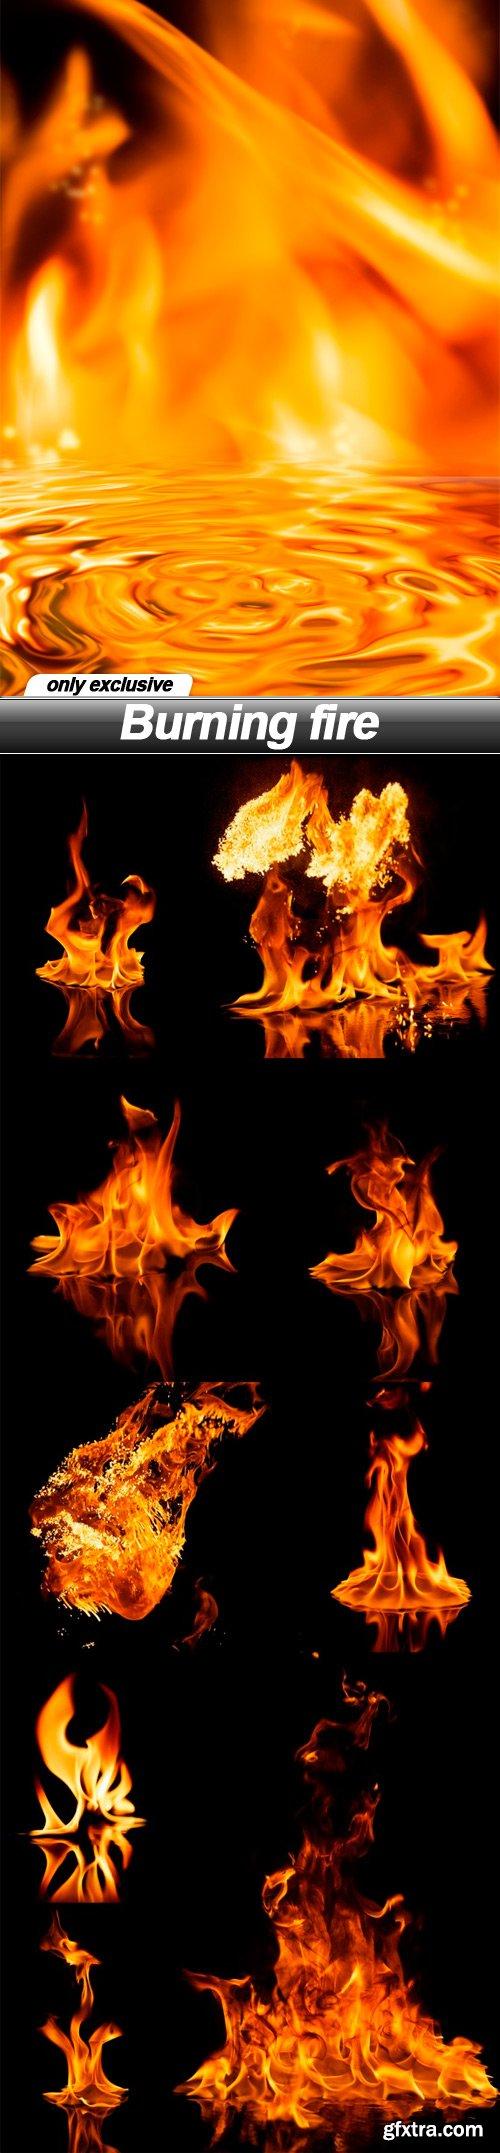 Burning fire - 10 UHQ JPEG